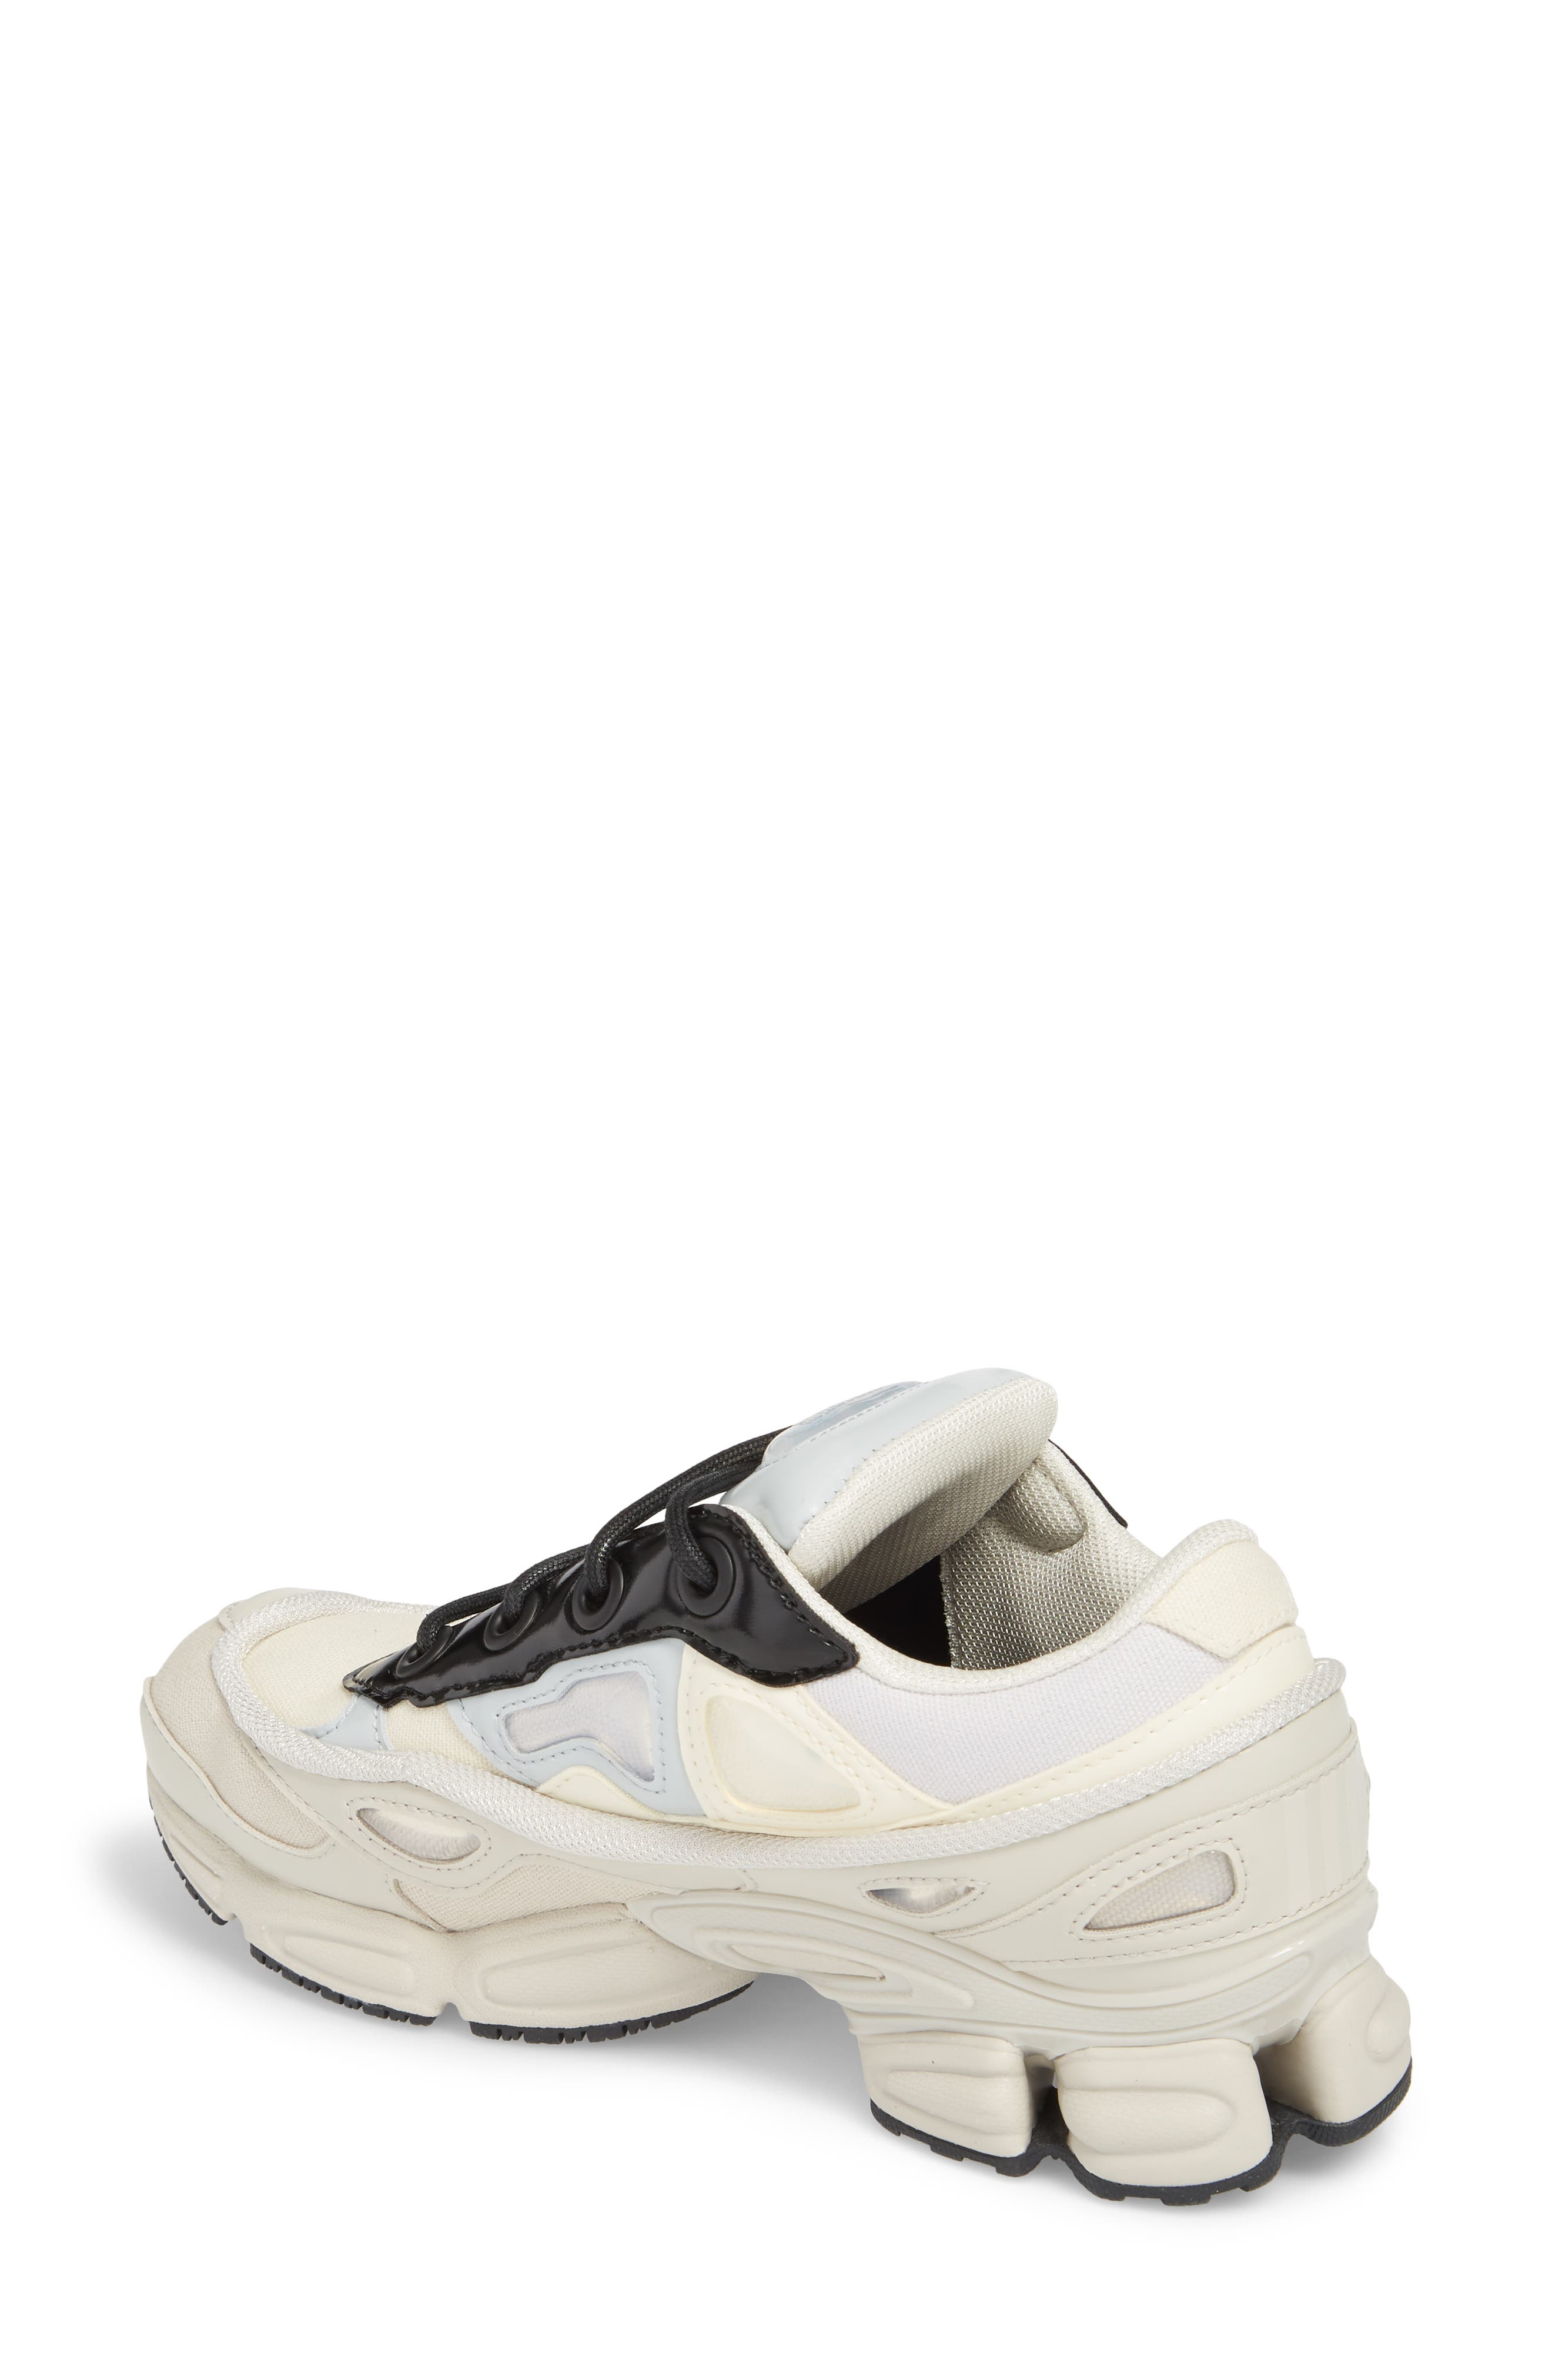 adidas by Raf Simons Ozweego III Sneaker,                             Alternate thumbnail 2, color,                             Cream White/ Mist Stone/ Black